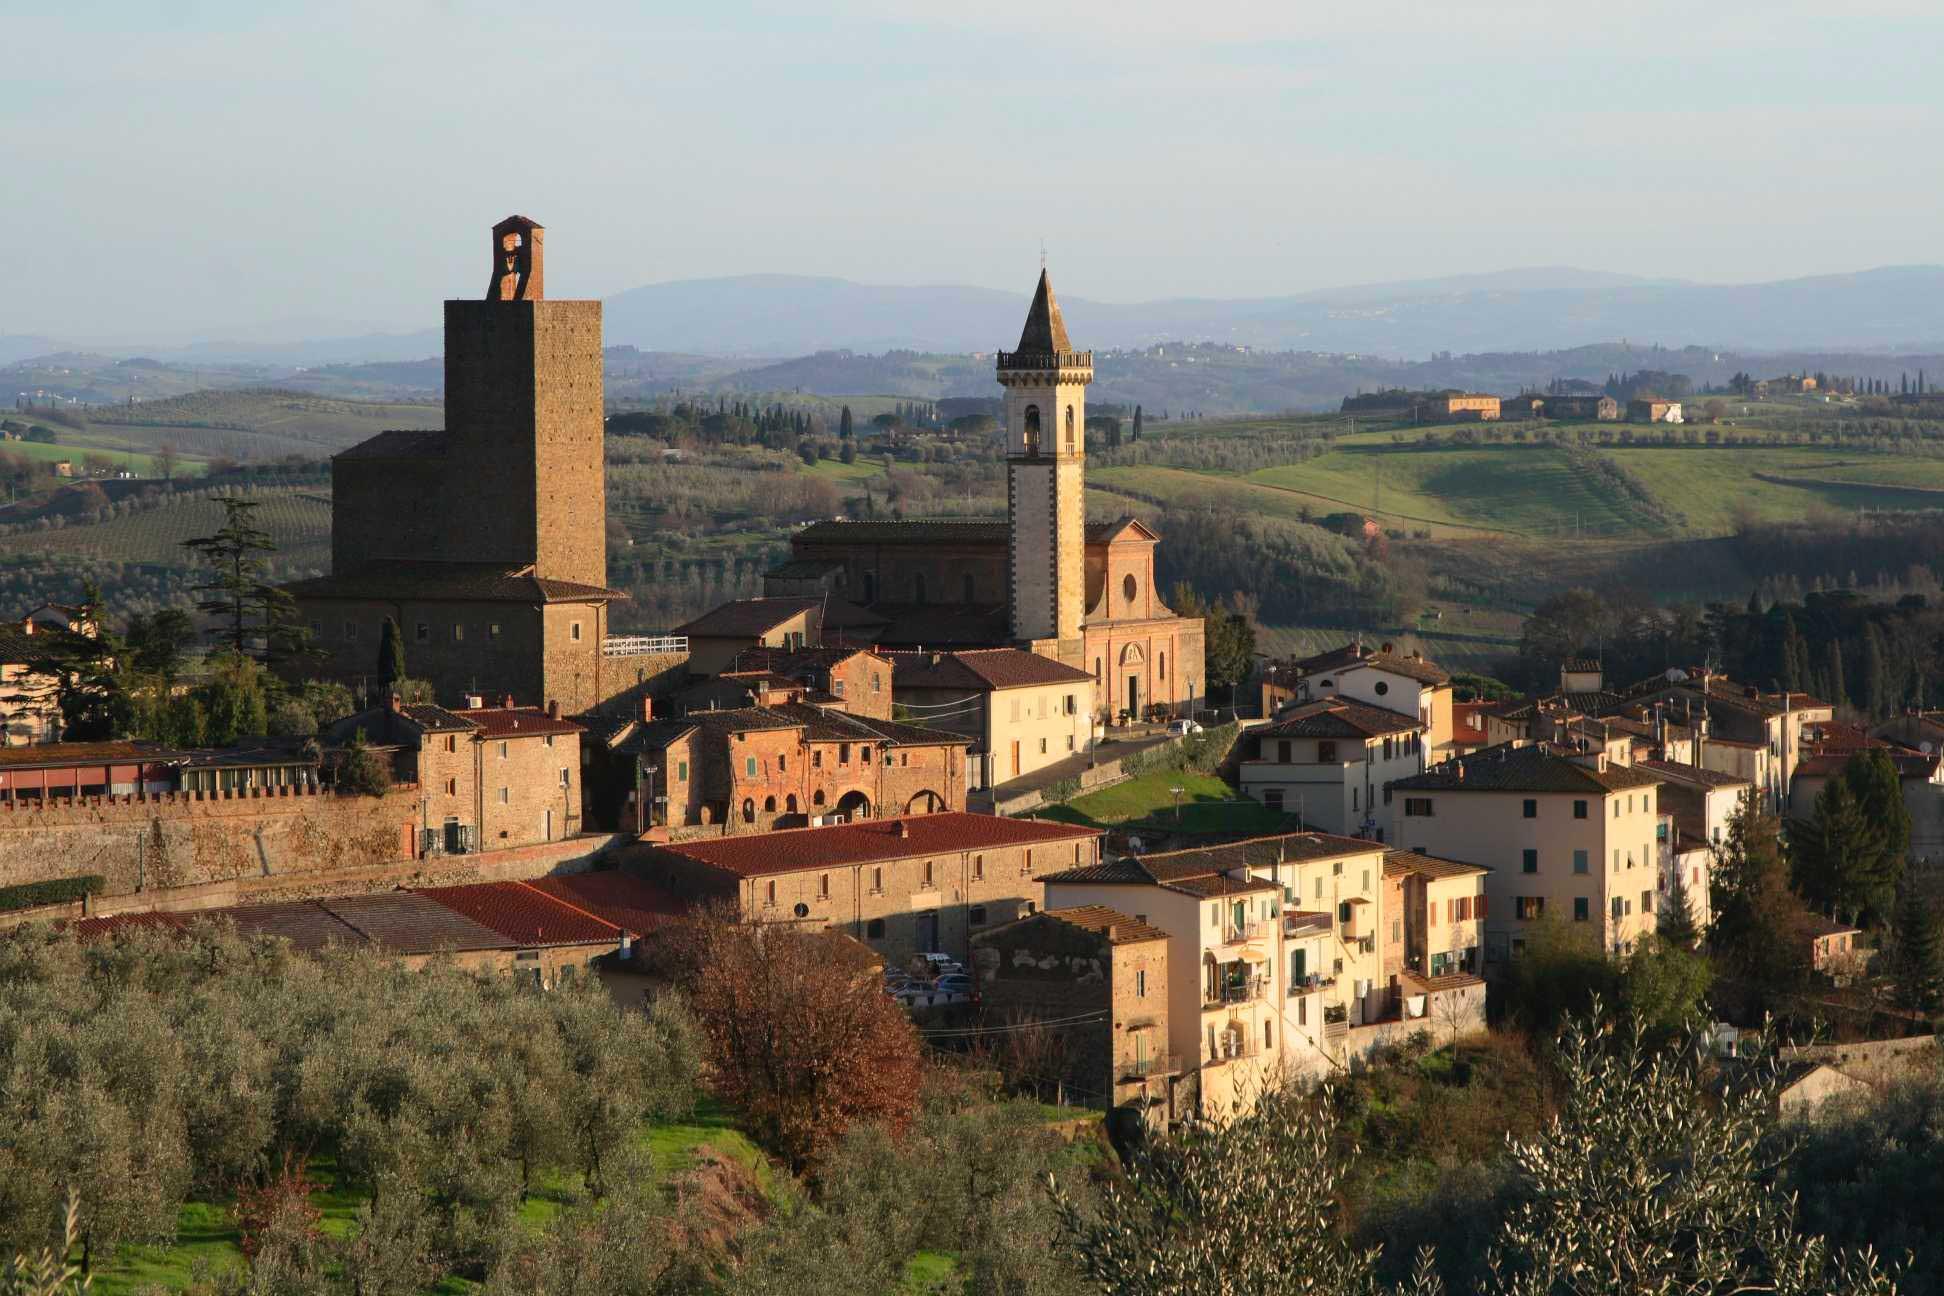 Agriturismo_caminetto_Toscana